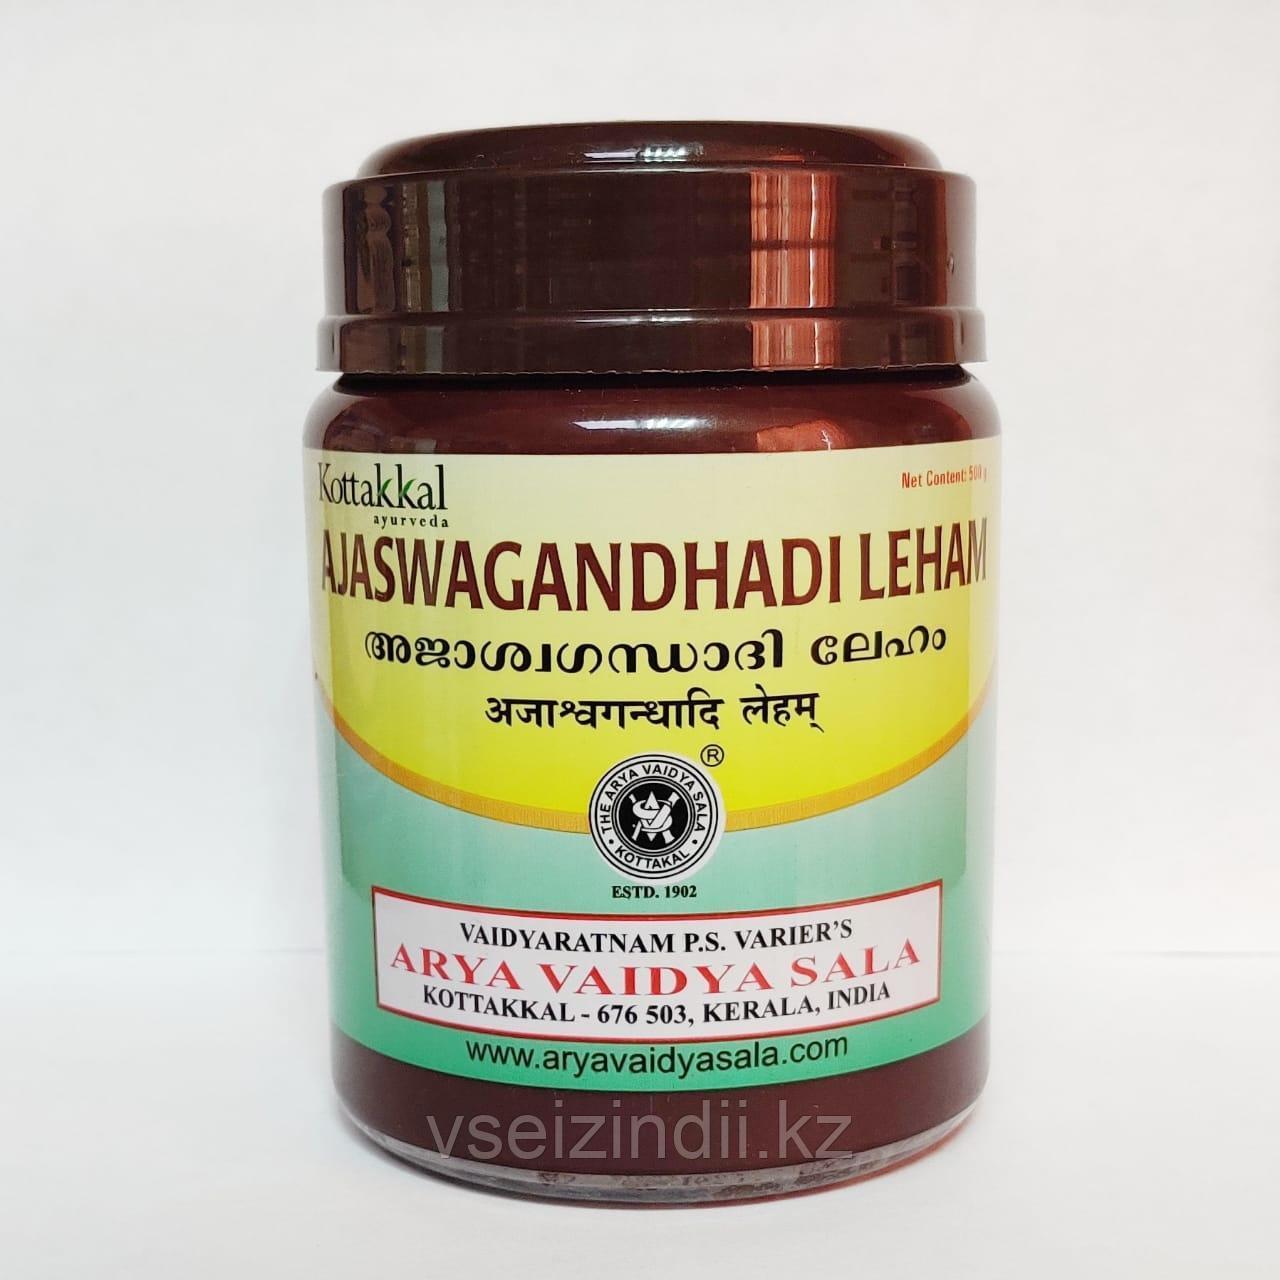 Ашвагандха Лехам с маслом гхи, 500 г, Коттаккал Аюрведа; Ajaswagandhadi Leham, 500 g, Kottakkal